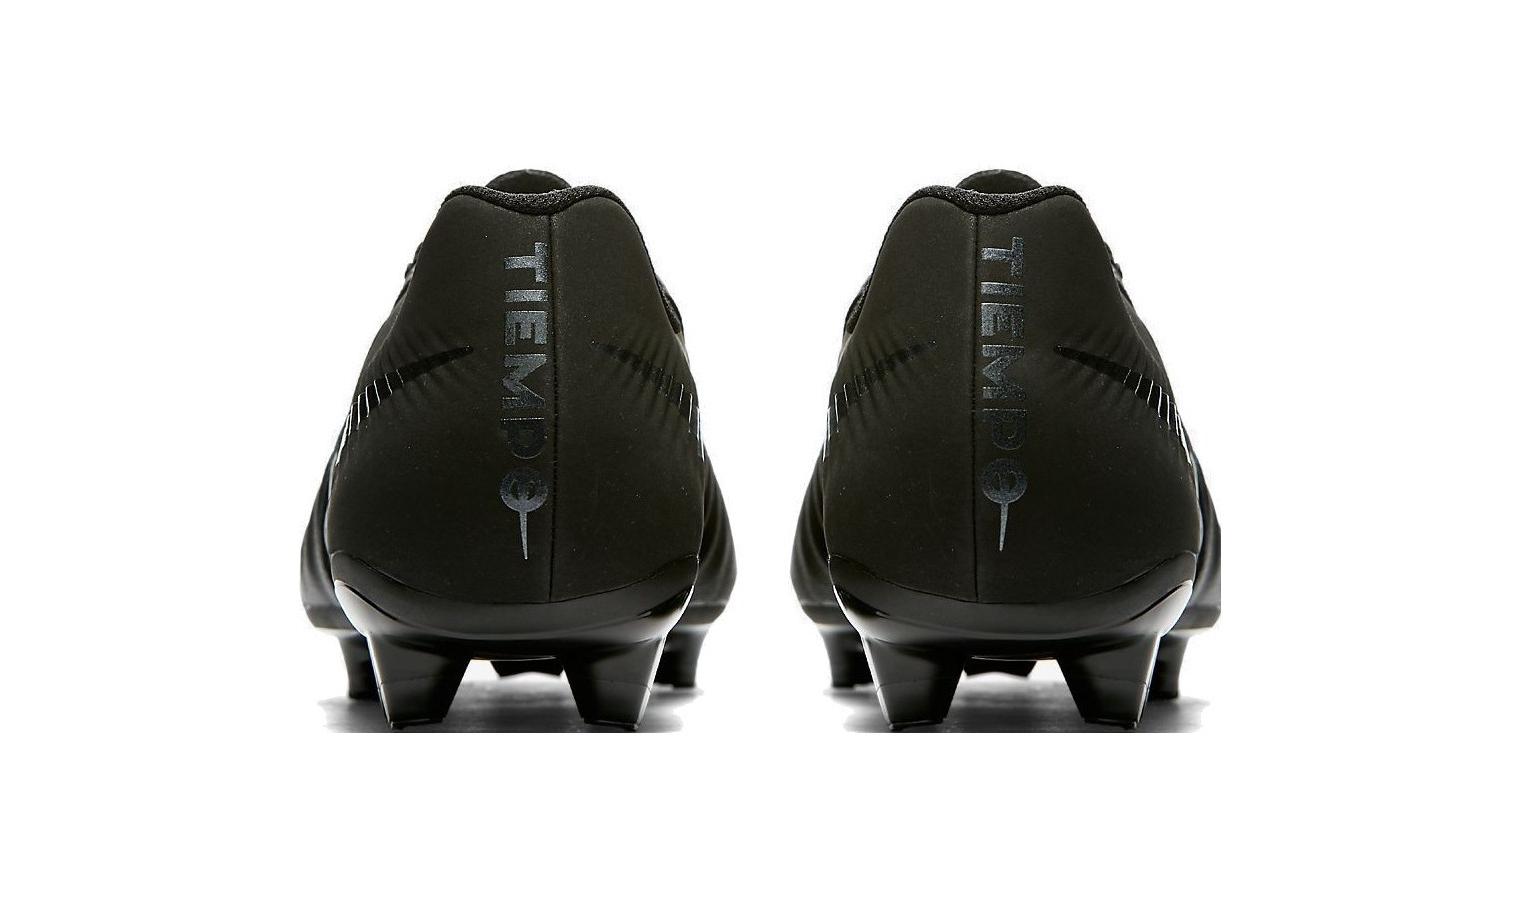 04f918c7f Kopačky lisovky Nike LEGEND 7 ACADEMY MG čierne   AD Sport.sk